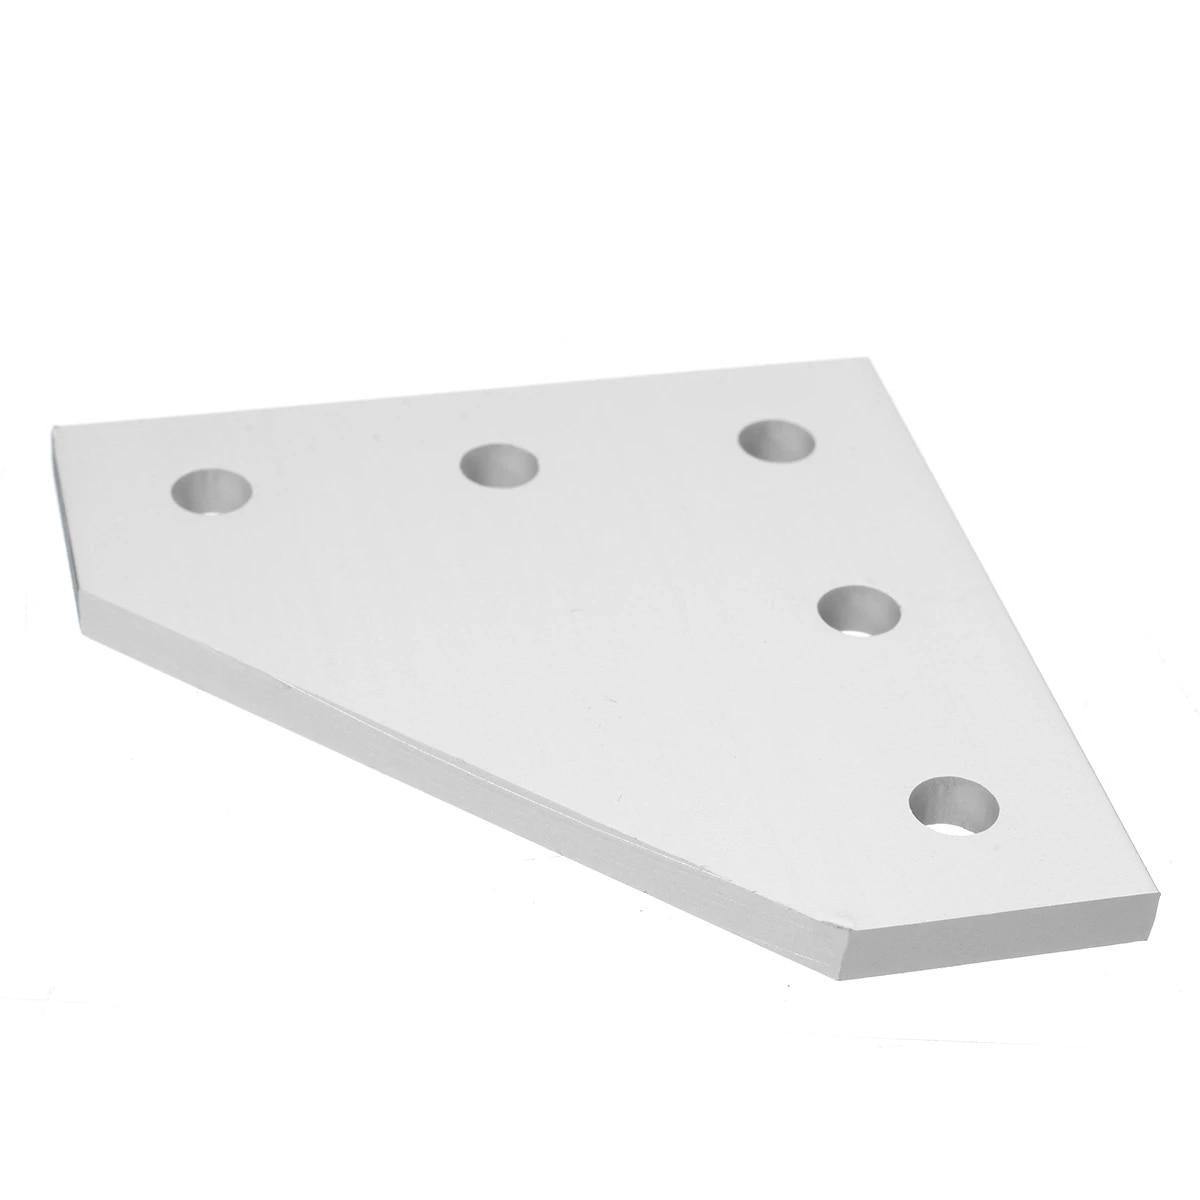 5 Hole 90 Degree Joint Board Corner Angle Bracket for 2020 Aluminum Profile DIY